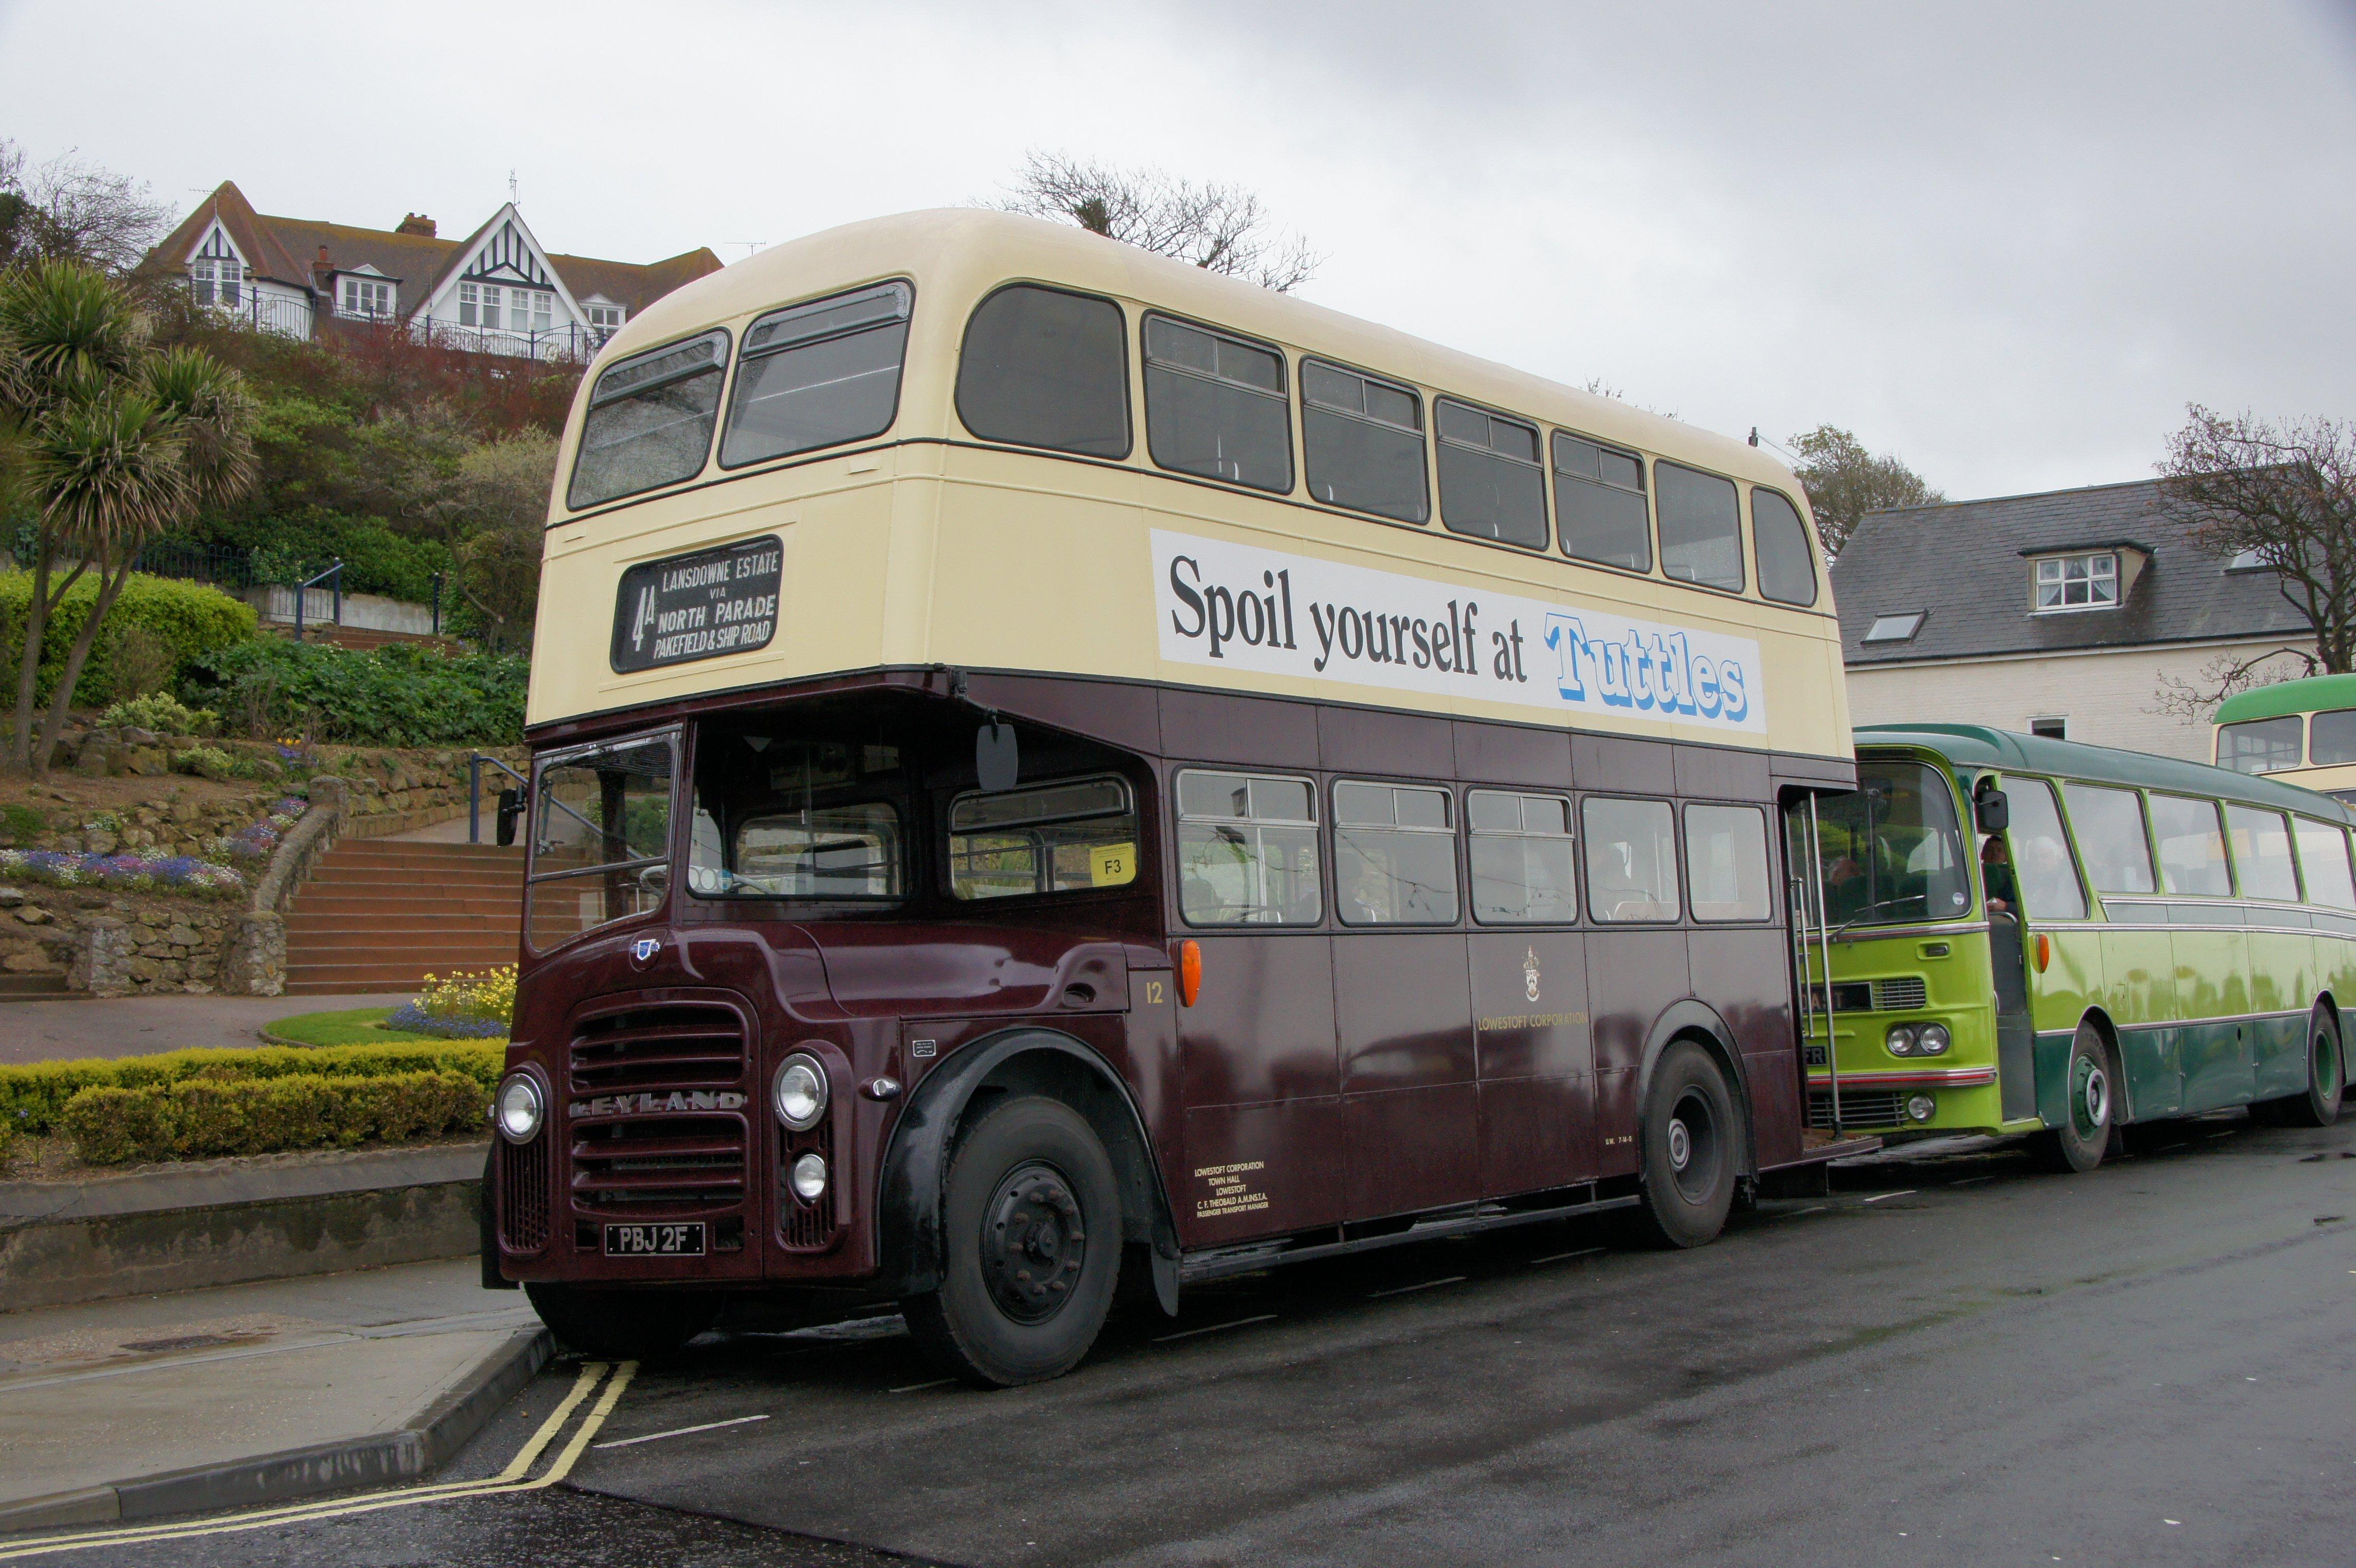 File:Lowestoft Corporation bus 12 (PBJ 2F), Felixstowe, 2 May 2012.jpg - Wikimedia Commons